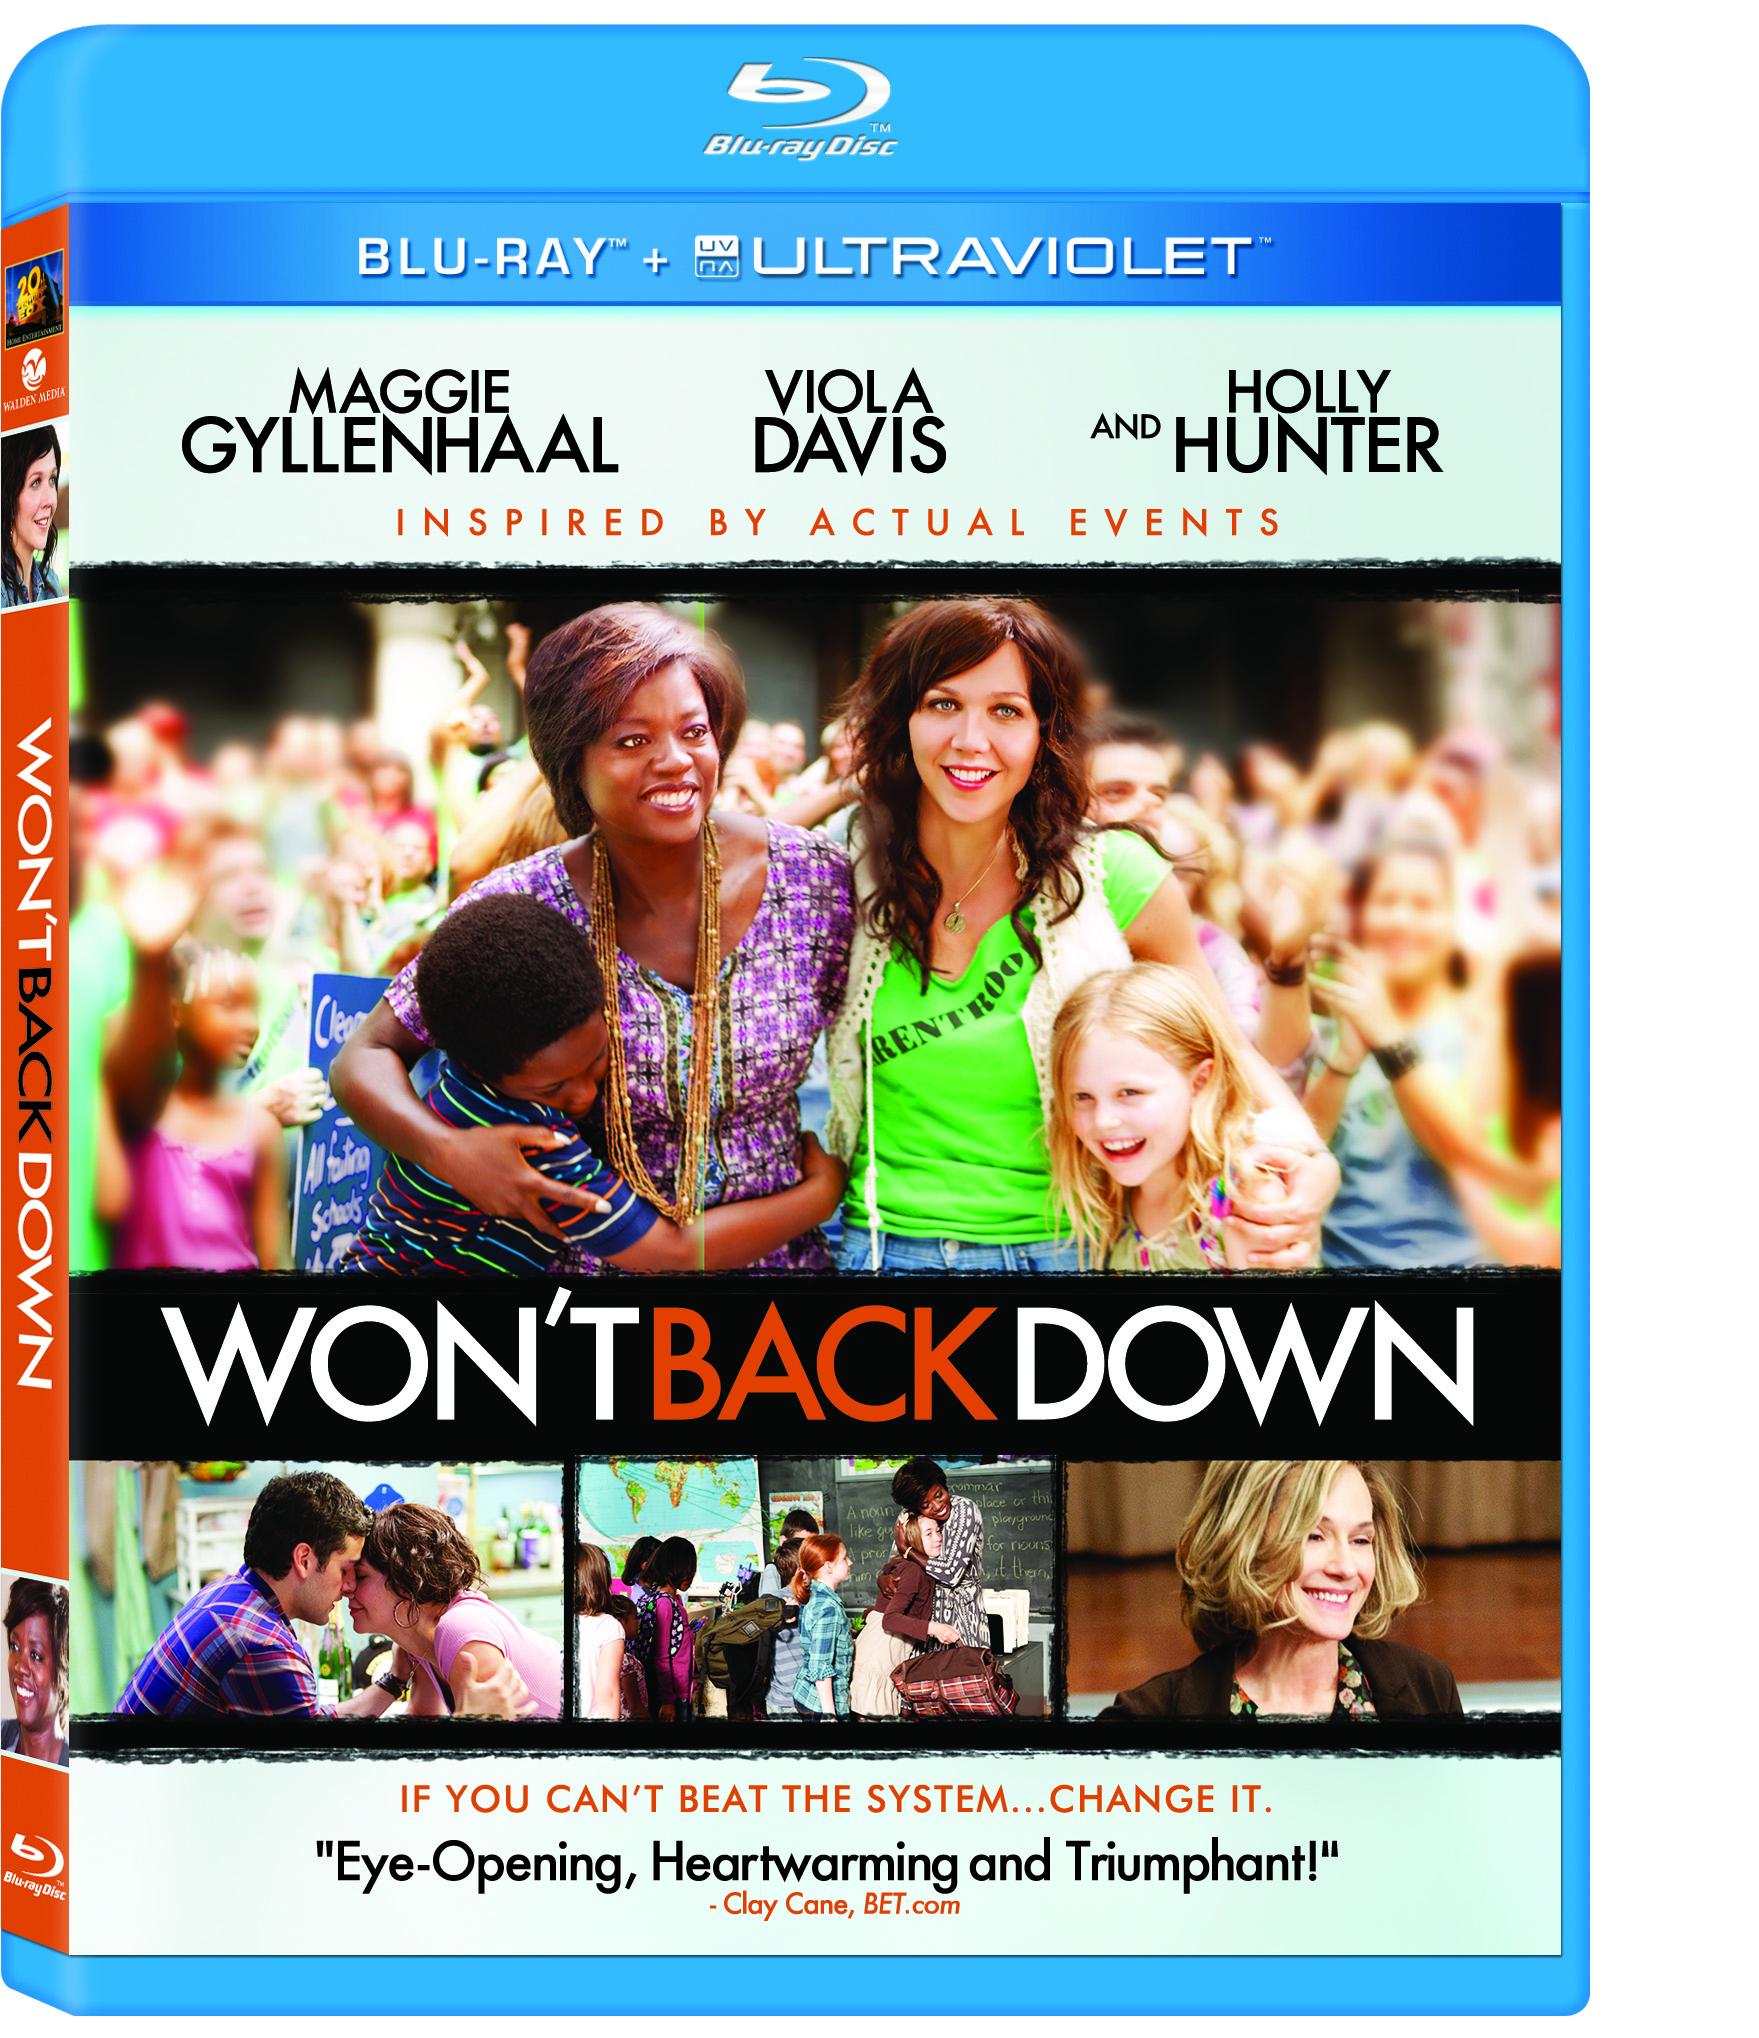 Won't Back Down 2012 movie